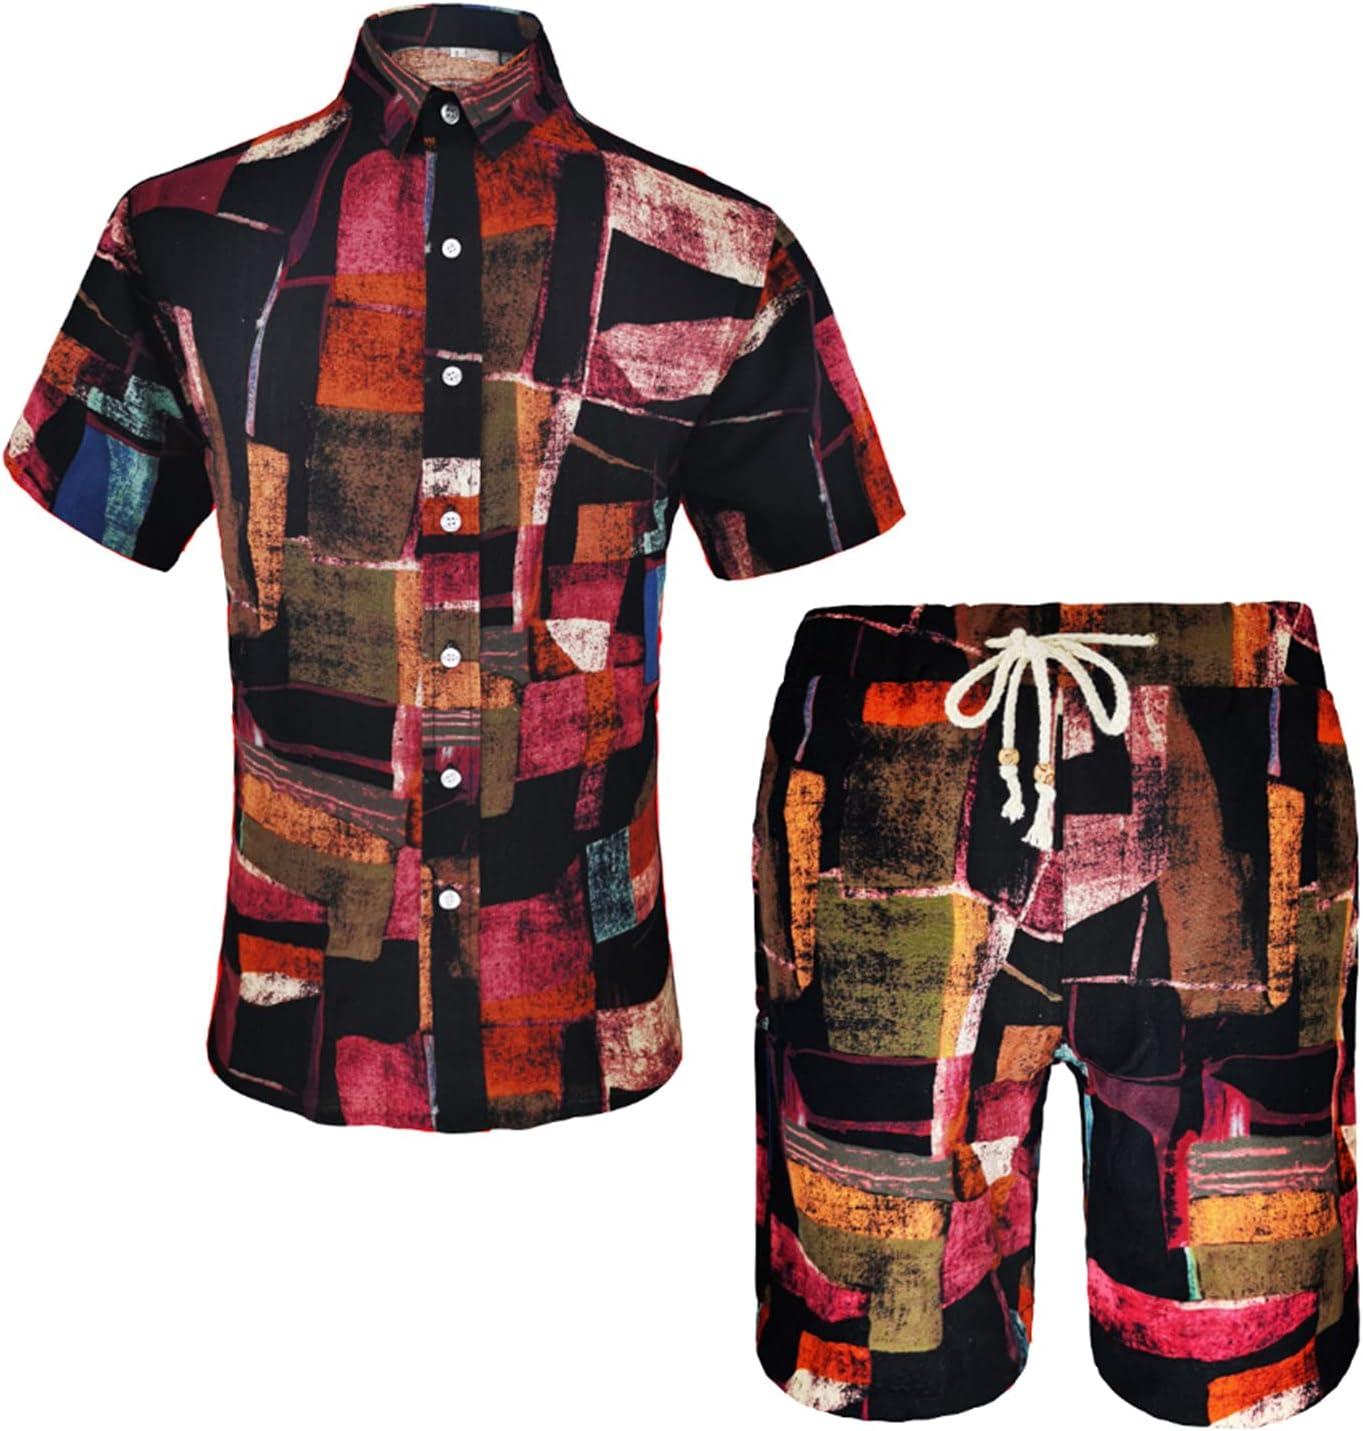 Men's Manufacturer regenerated product Summer Kansas City Mall Casual Hawaiian Short Sleeve Suits Ethnic Sty Shirt